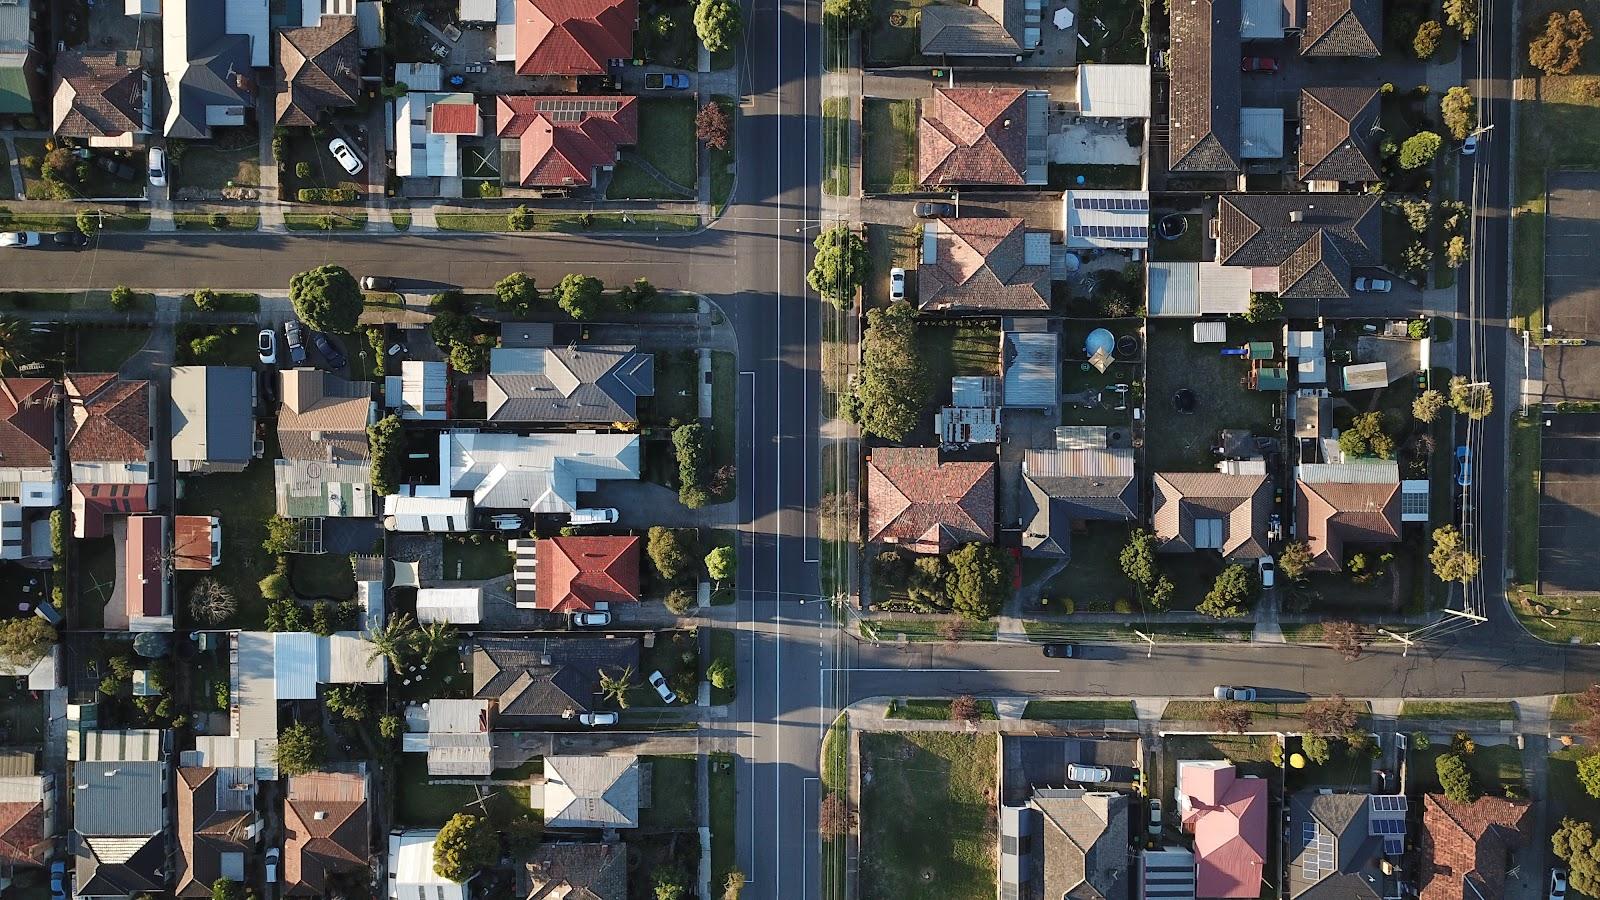 Aerial view of suburban Australian streets